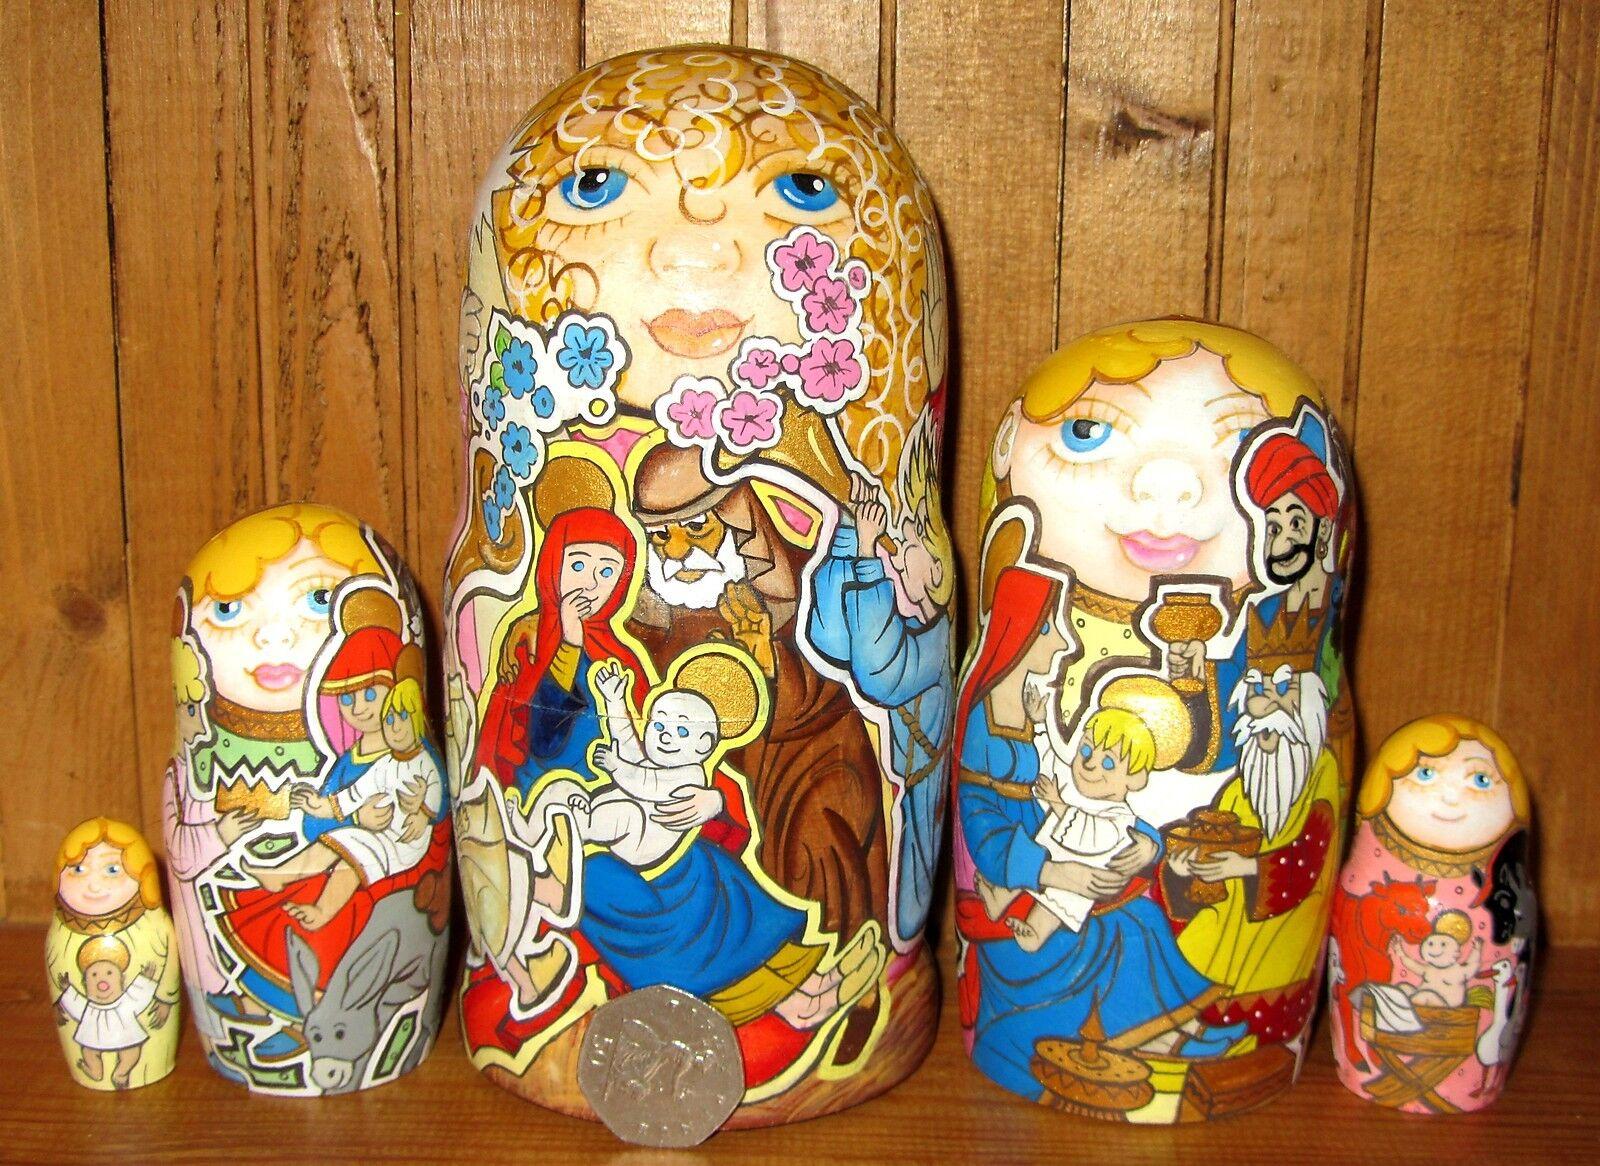 Natividad Bebé Jesús María Joseph Angel Matrioska Muñecas-caja Rusas 5 Firmado